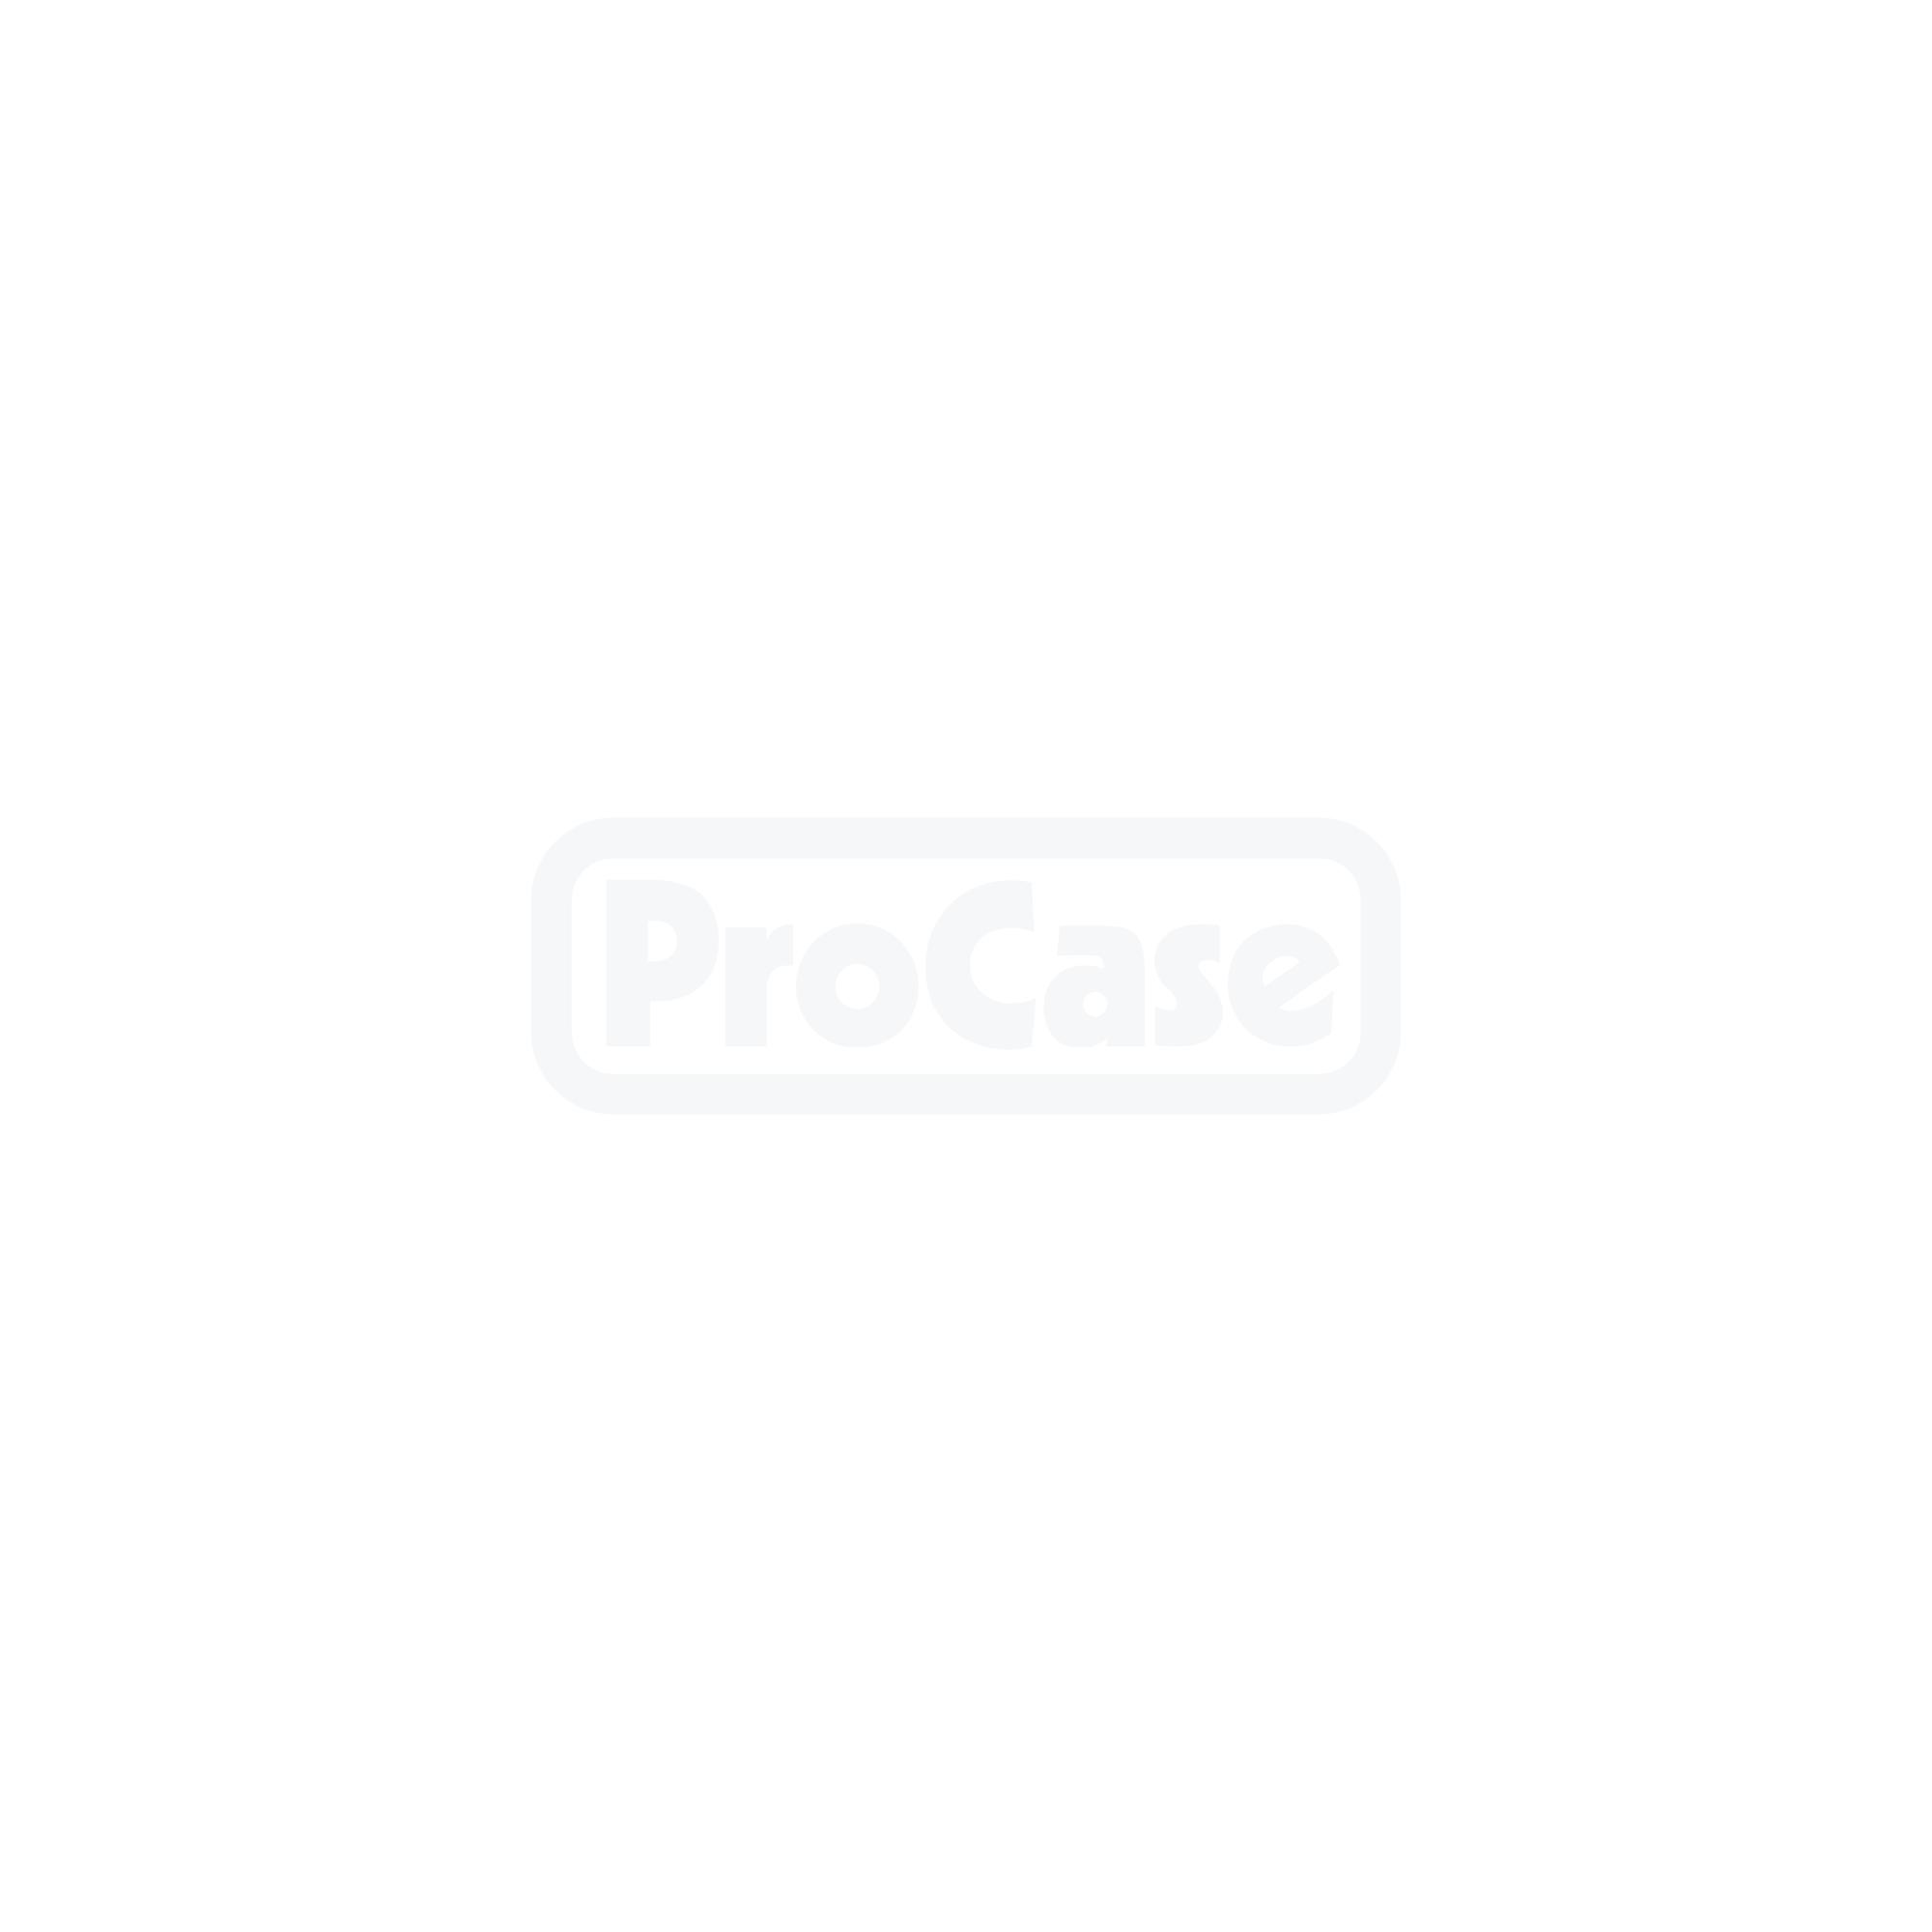 Flightcase für Futurelight ODD-L Outdoor Dome 2